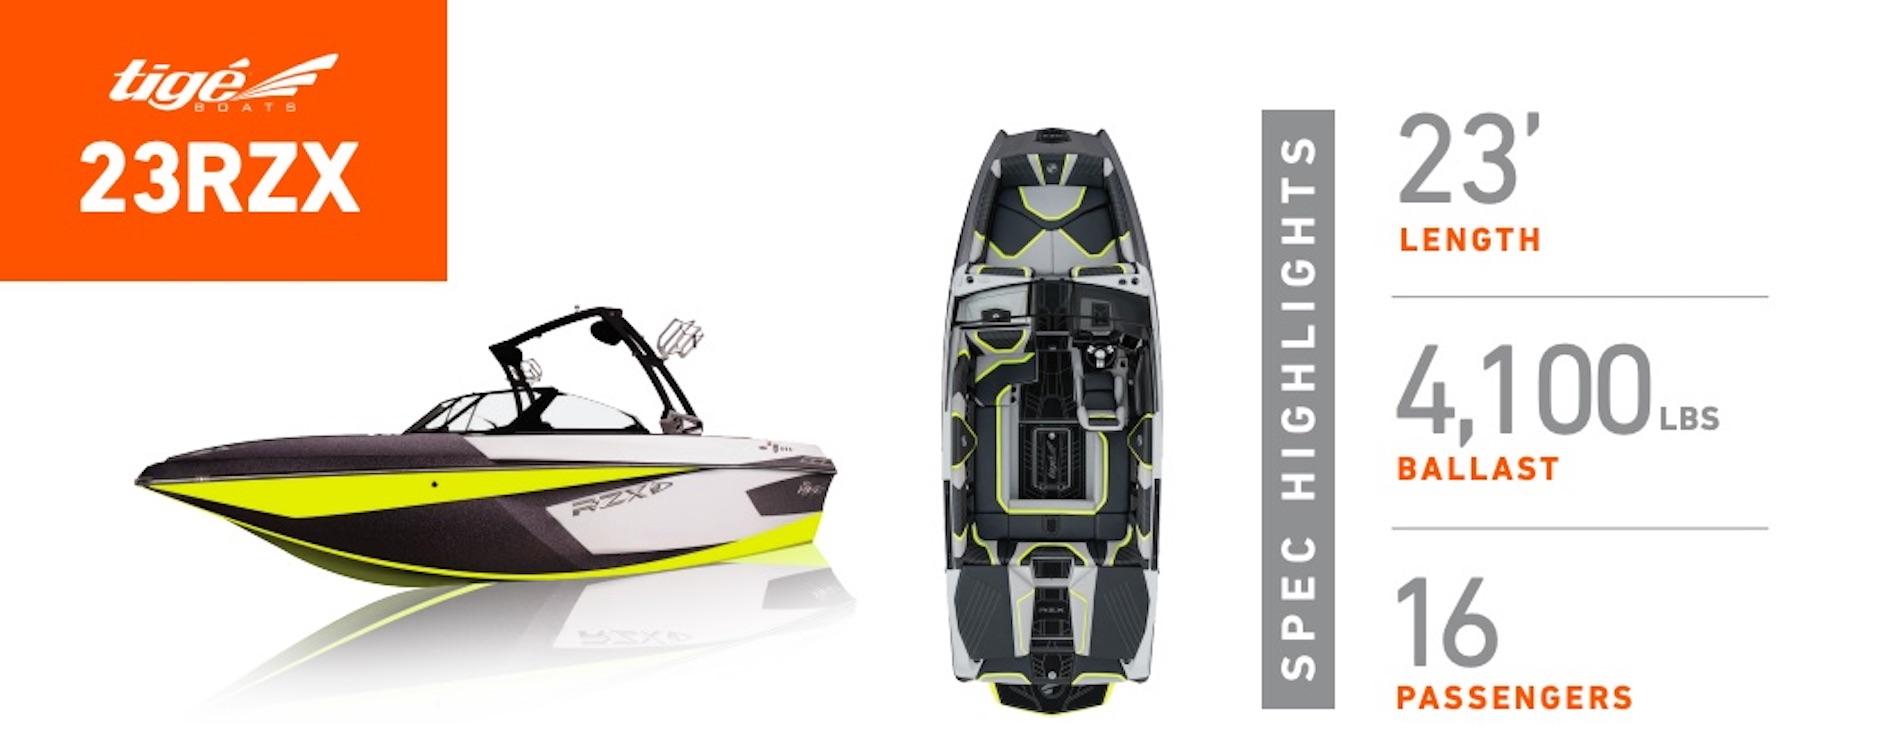 Tige-Boat-23RZX-SpechSeet